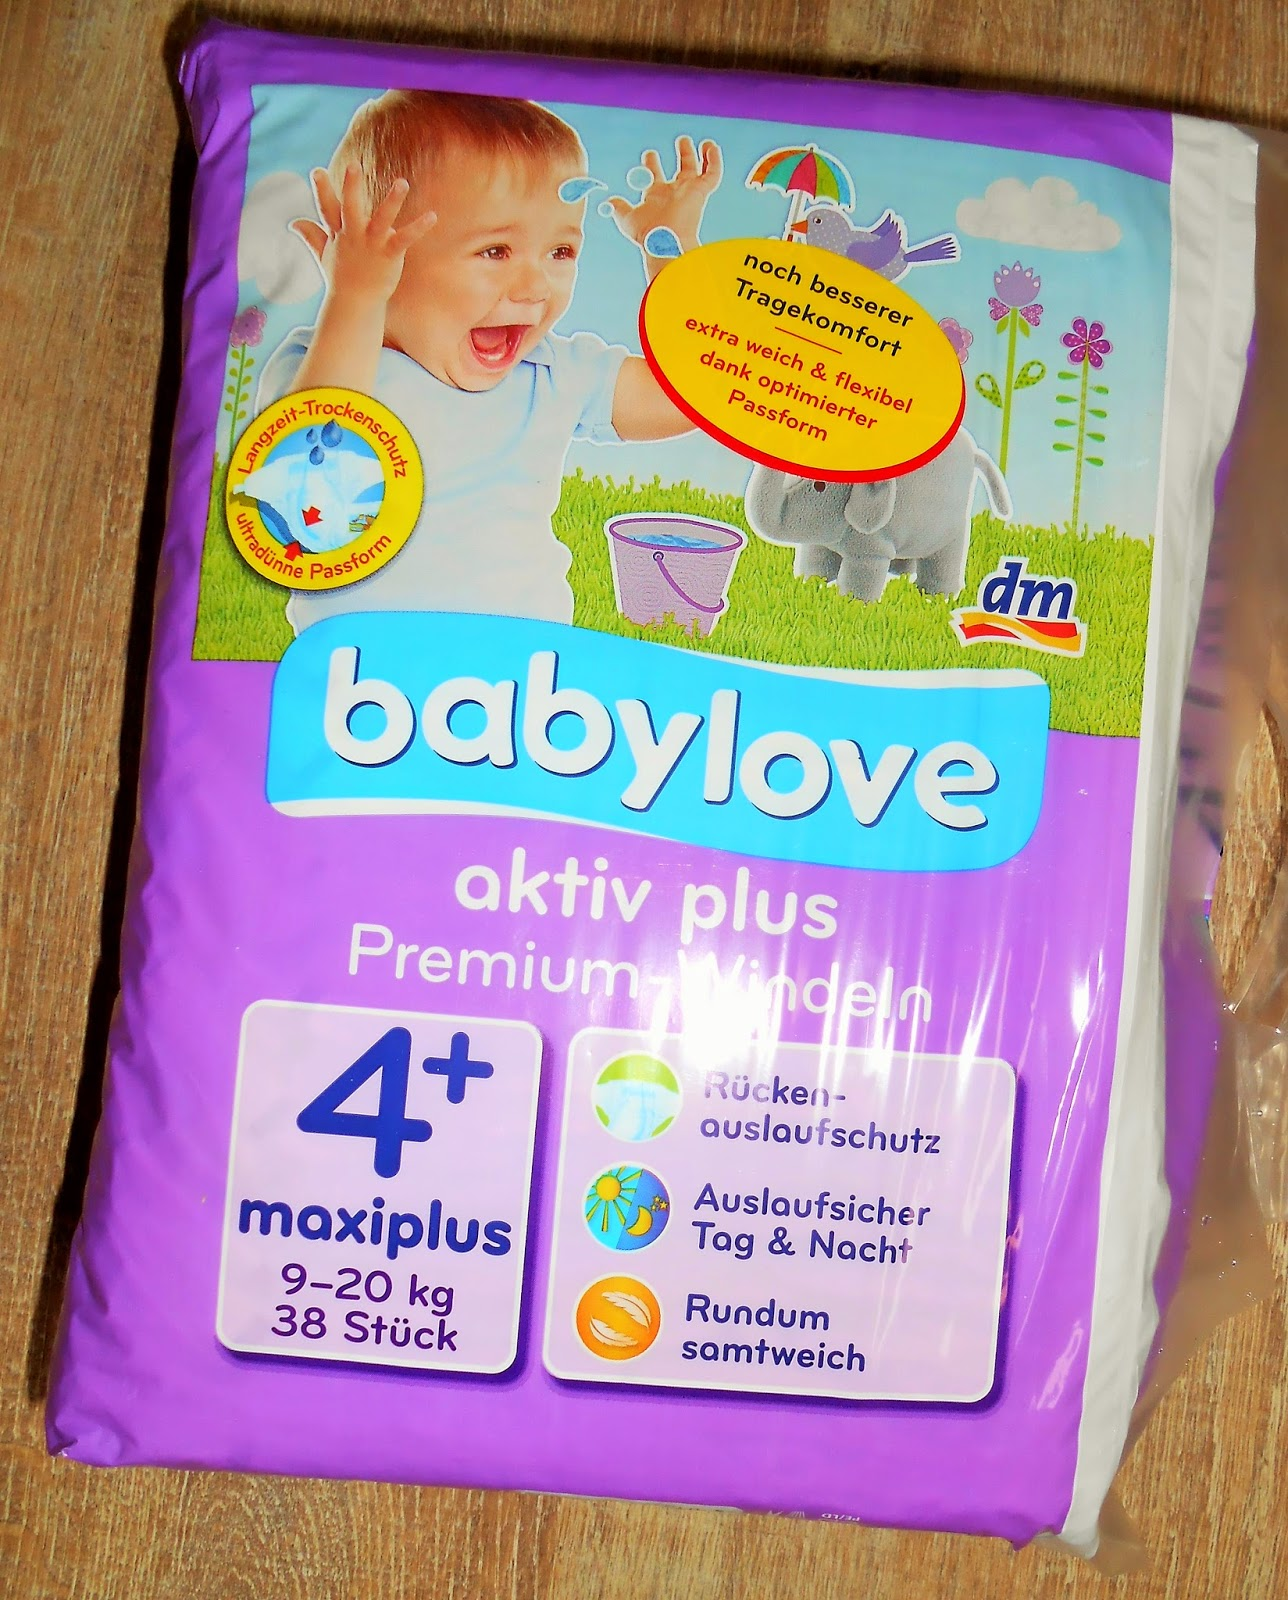 http://www.dm.de/de_homepage/babylove/produkte/windeln/premium-windeln/91606/babylove-premium-windeln-maxiplus-9-20-kg.html